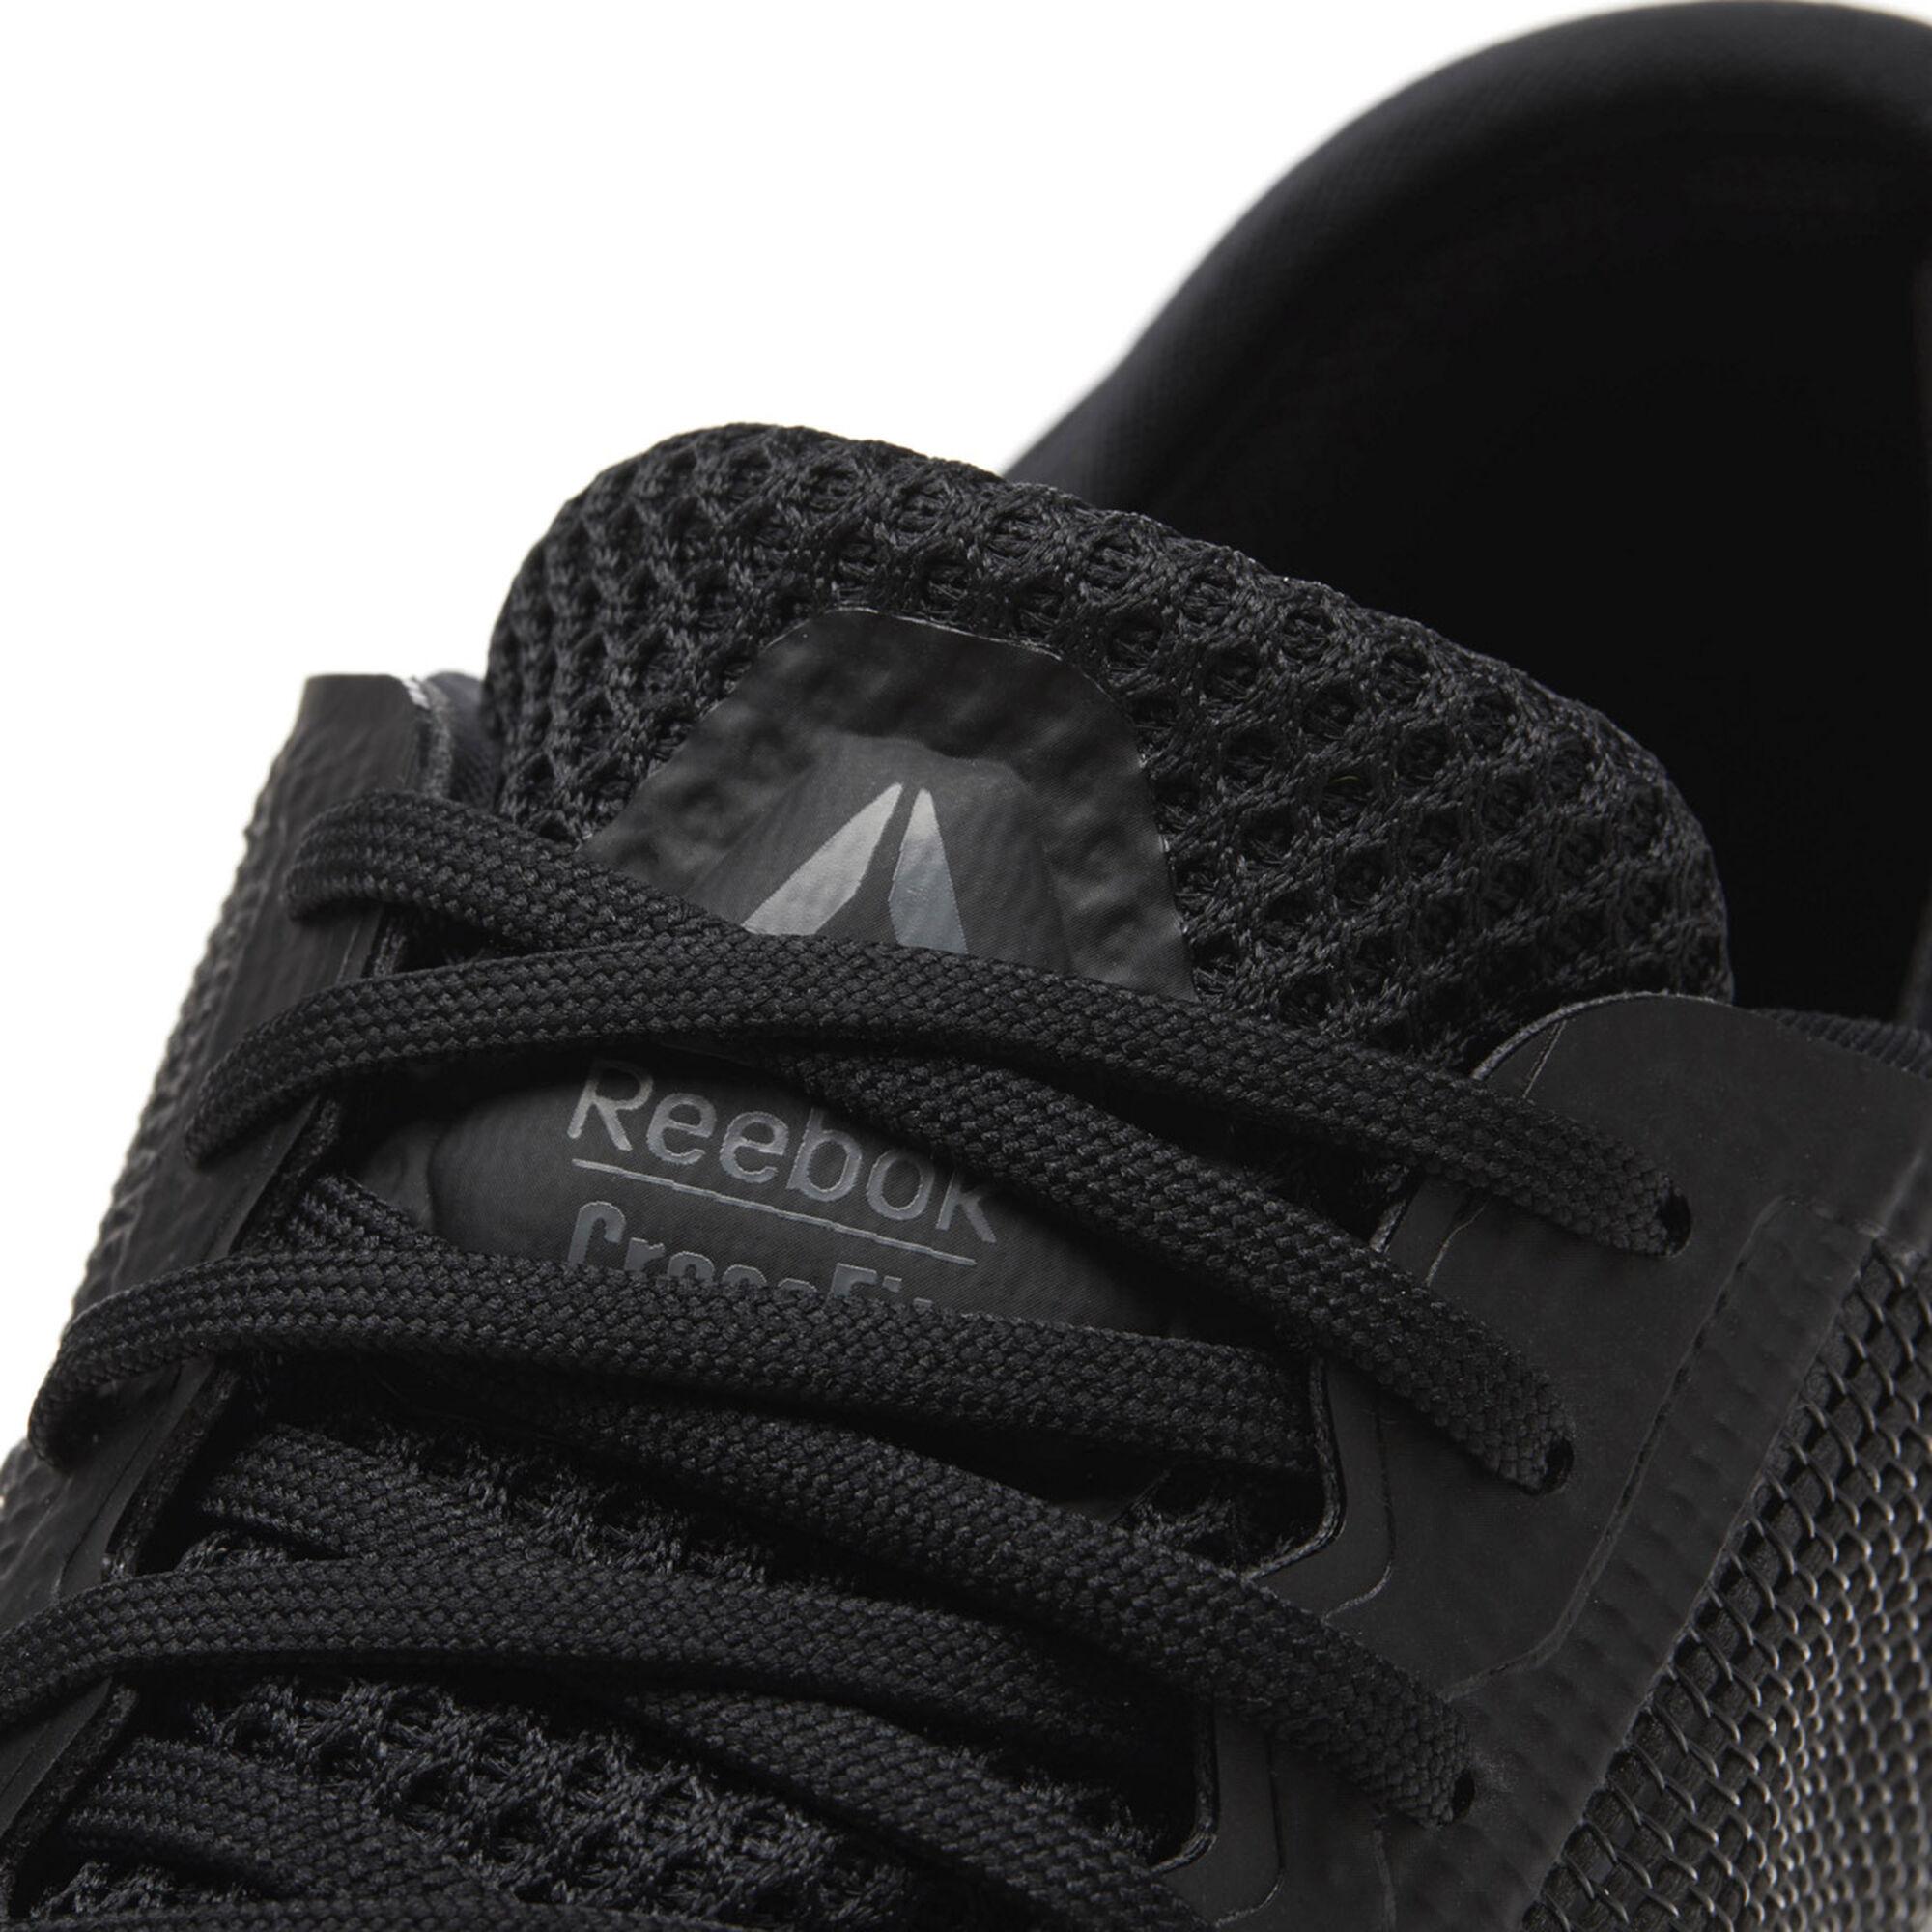 Reebok  Reebok  Reebok  Reebok  Reebok  Reebok. Crossfit Nano 8.0 ... db469954f6f